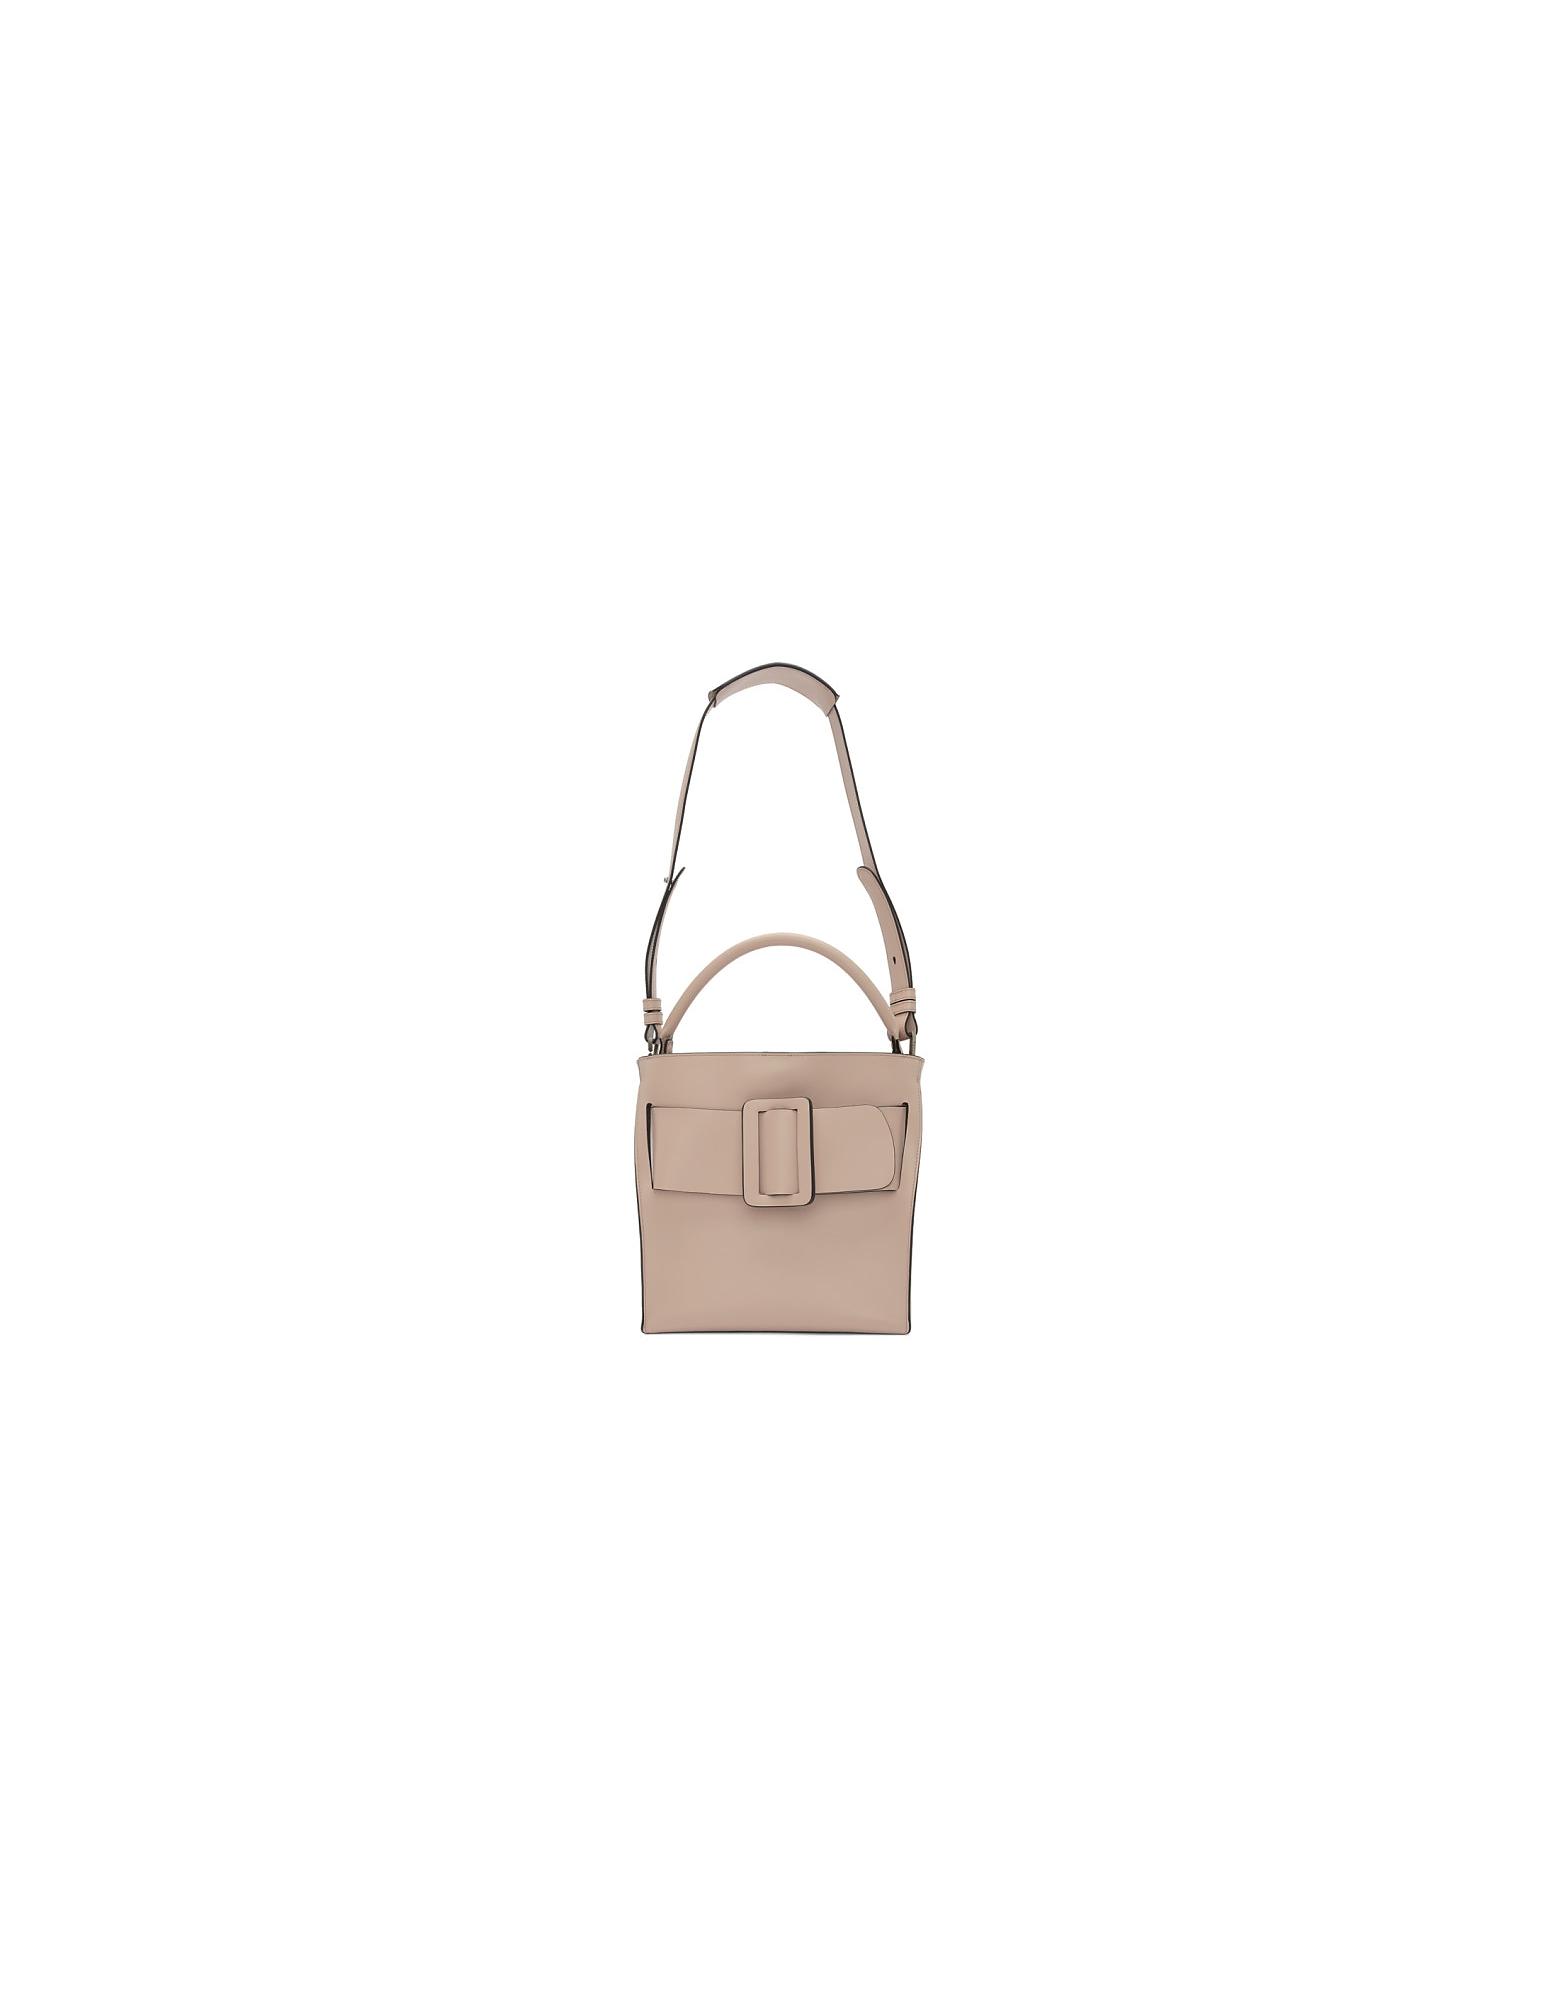 BOYY Designer Handbags, Pink Devon Top Handle Bag